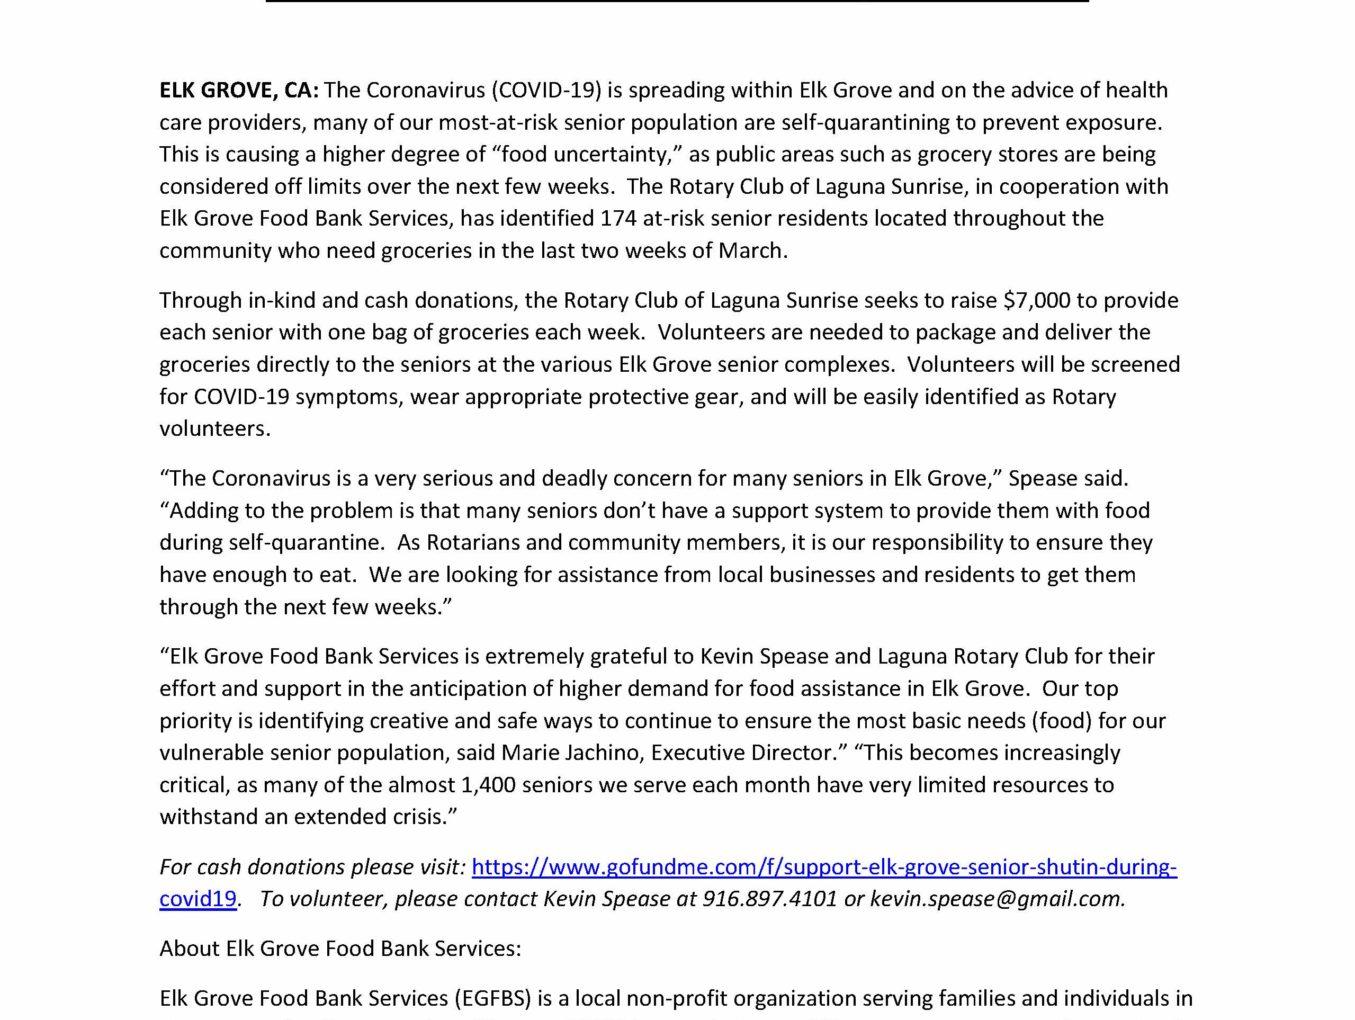 PRESS RELEASE: Feeding Elk Grove Self-Quarantined Seniors